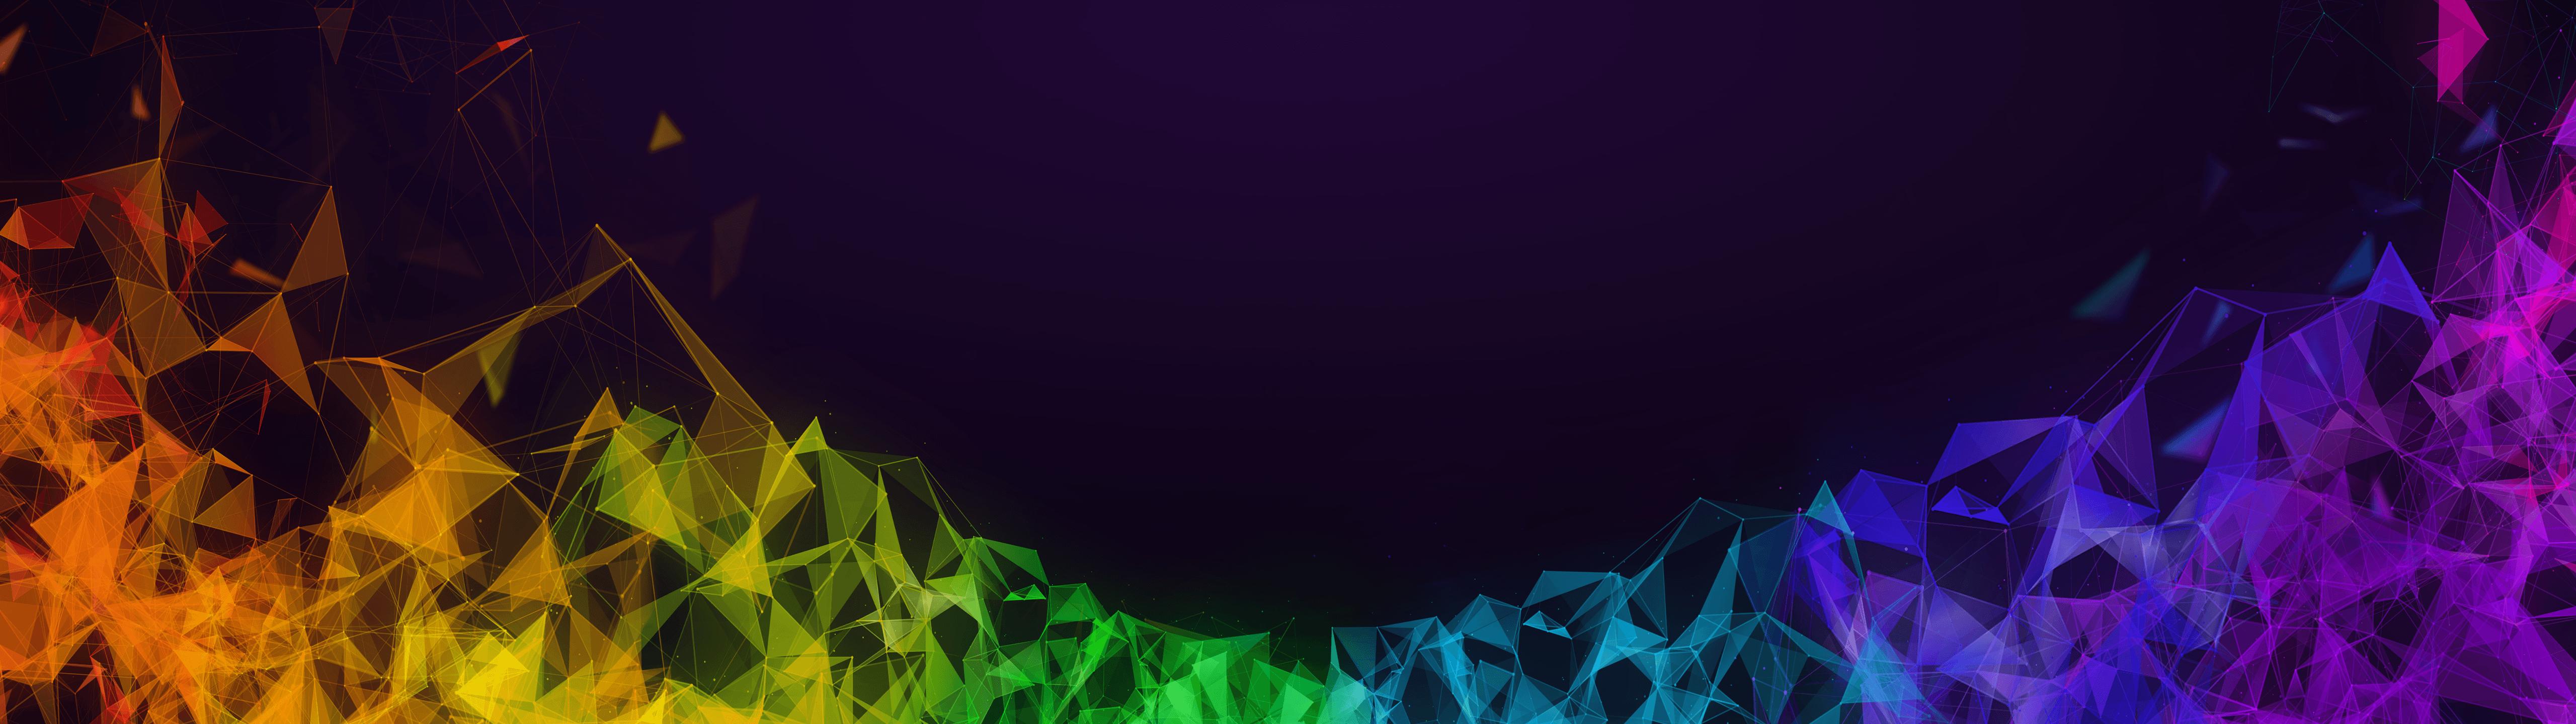 Prism Razer Wallpapers Wallpaper Cave